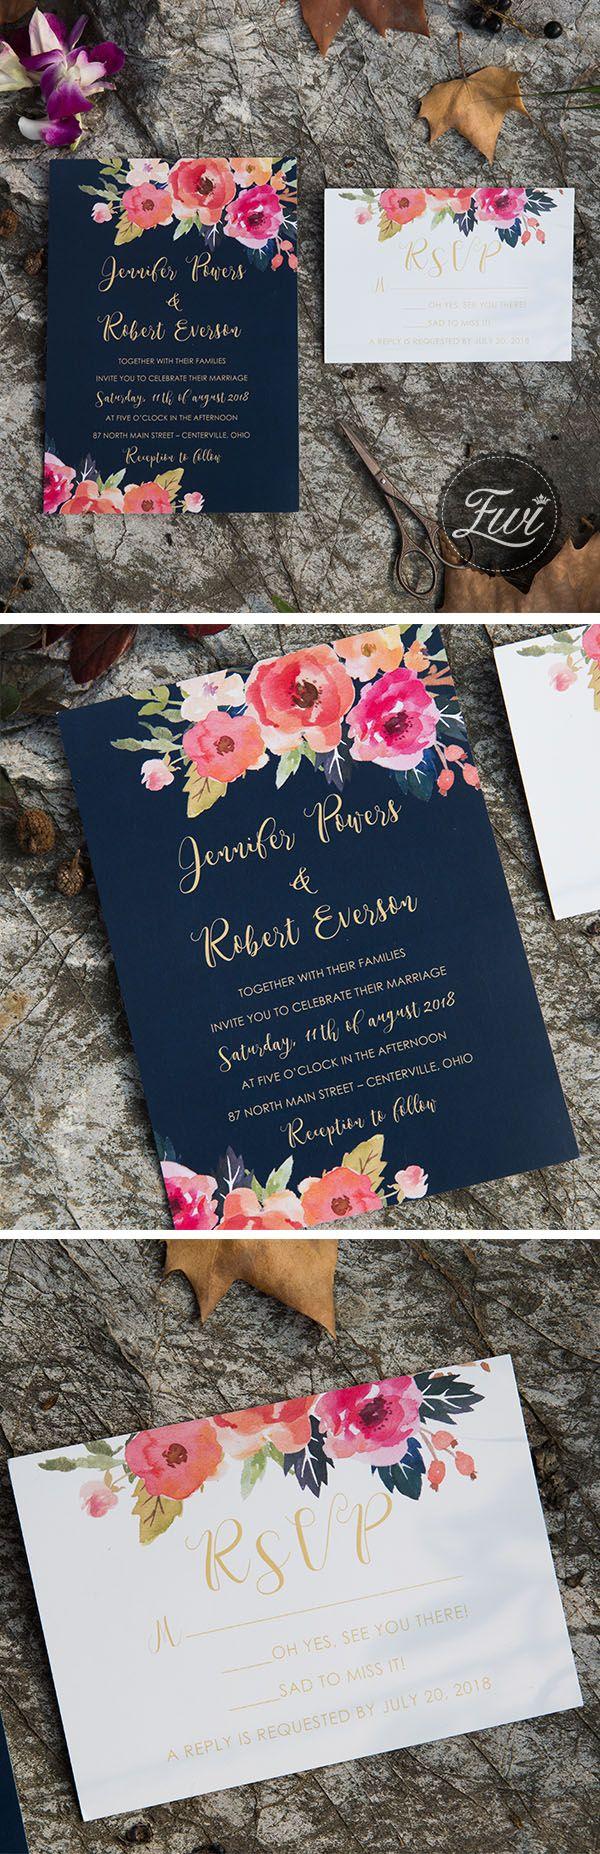 Wedding reception wedding decorations 2018 november 2018 romantic navy blue and floral coral wedding invitation set EWI as